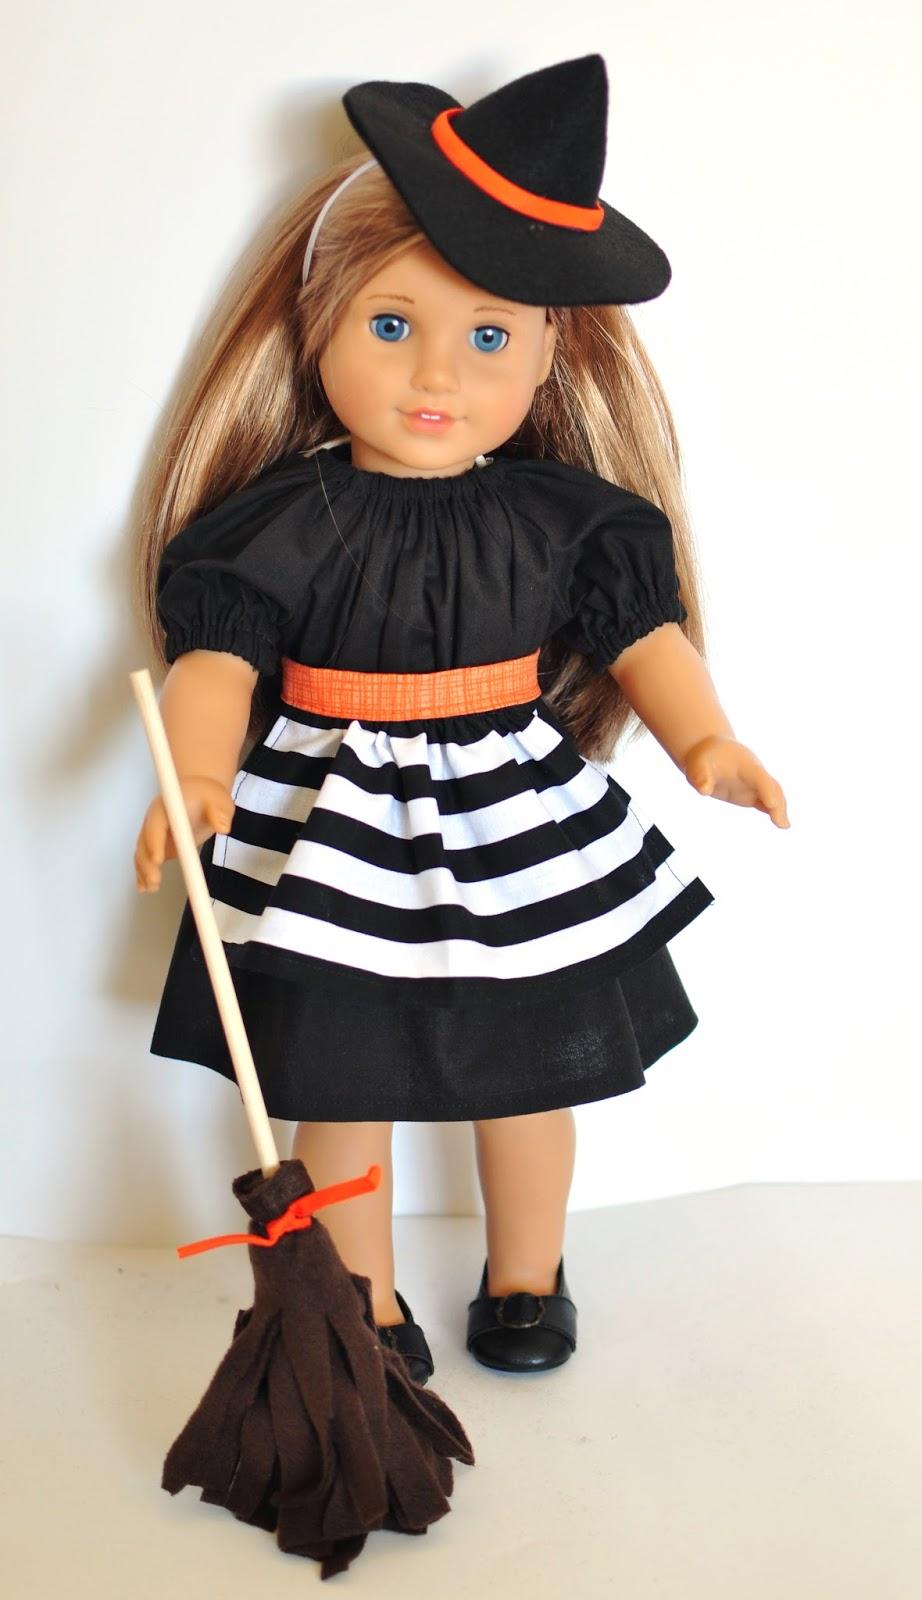 Handmade Halloween: Because dolls need costumes too, right ...